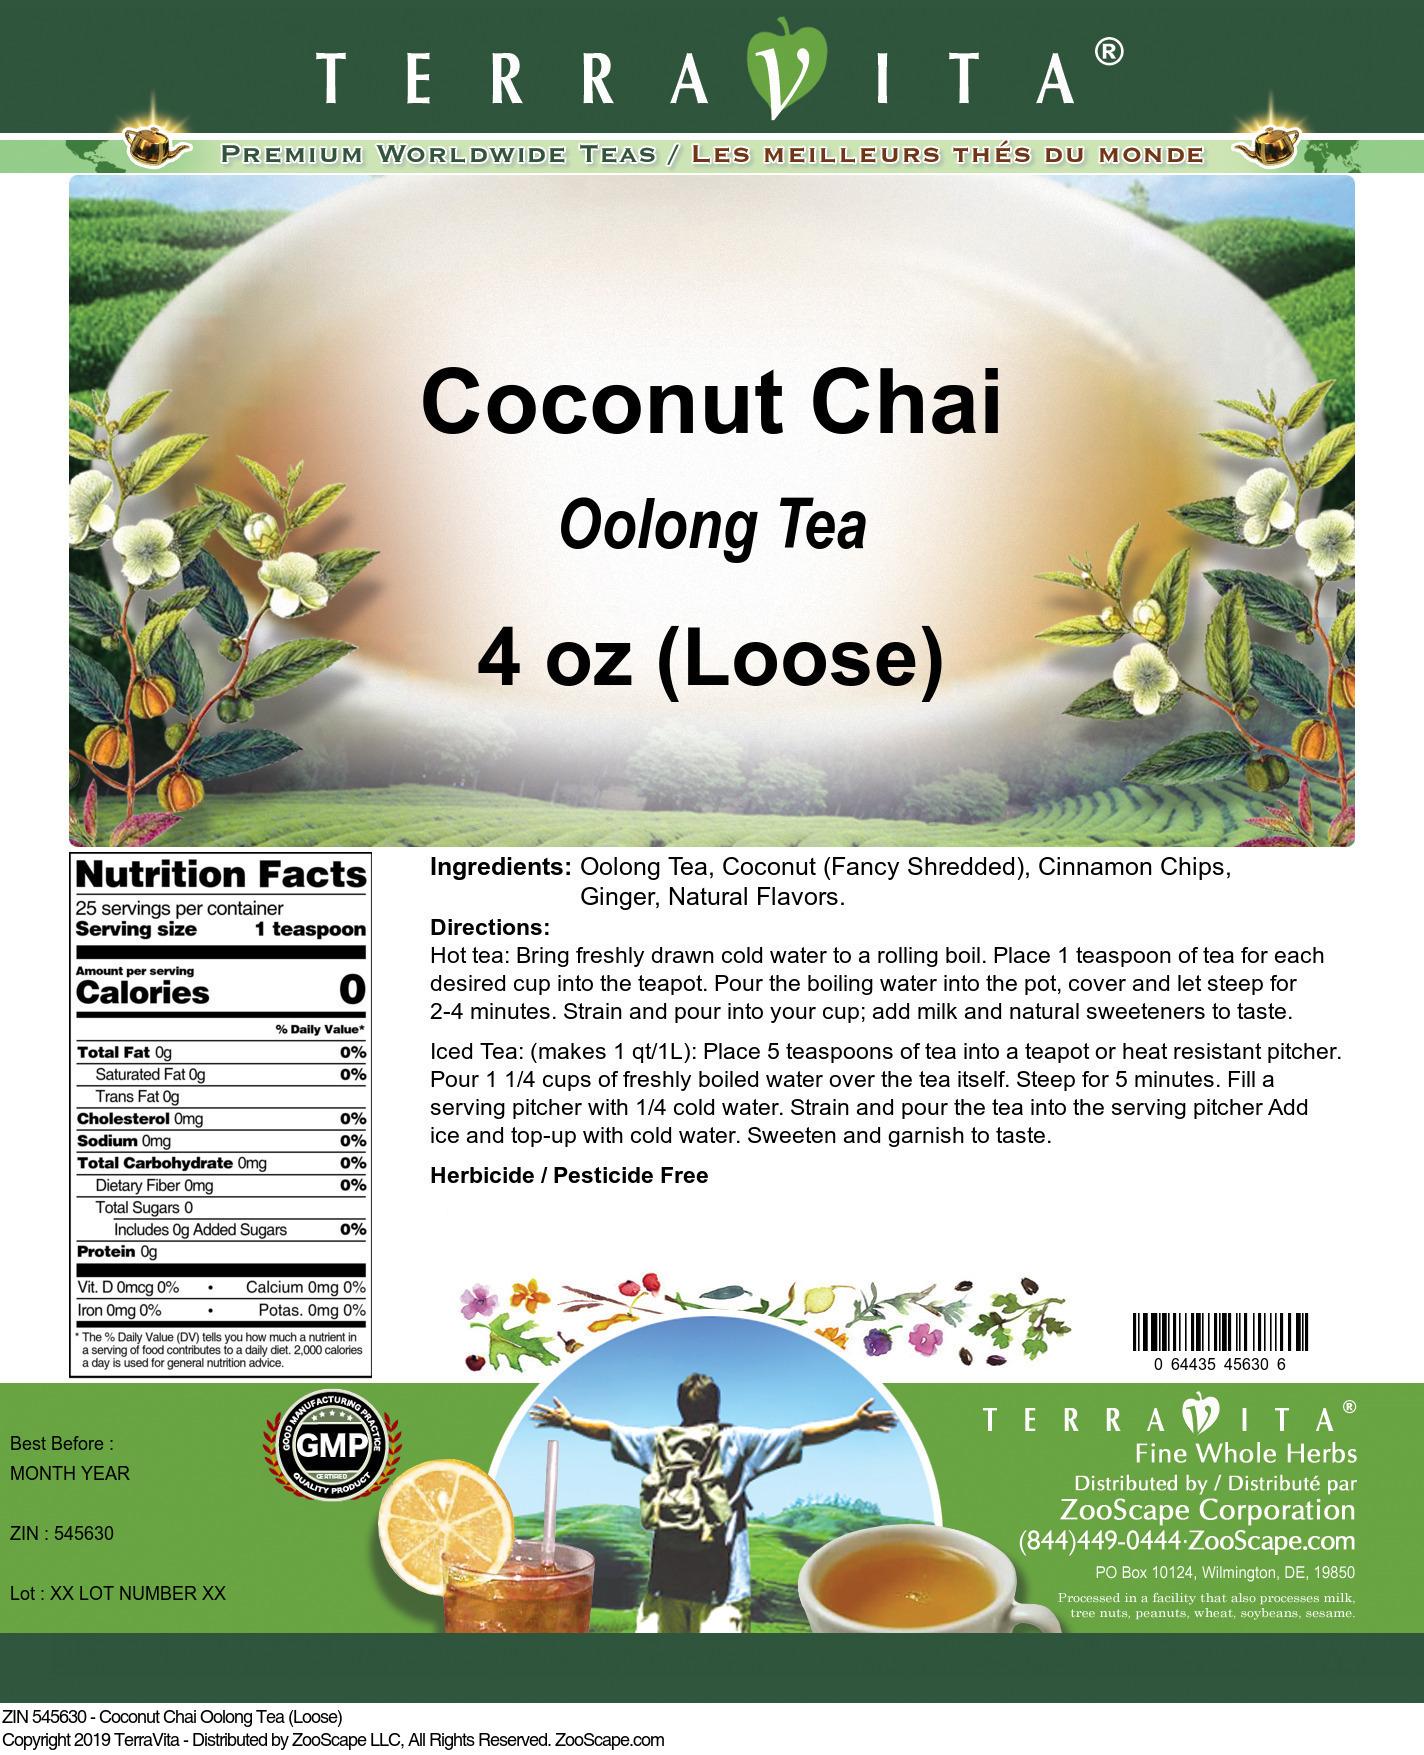 Coconut Chai Oolong Tea (Loose)